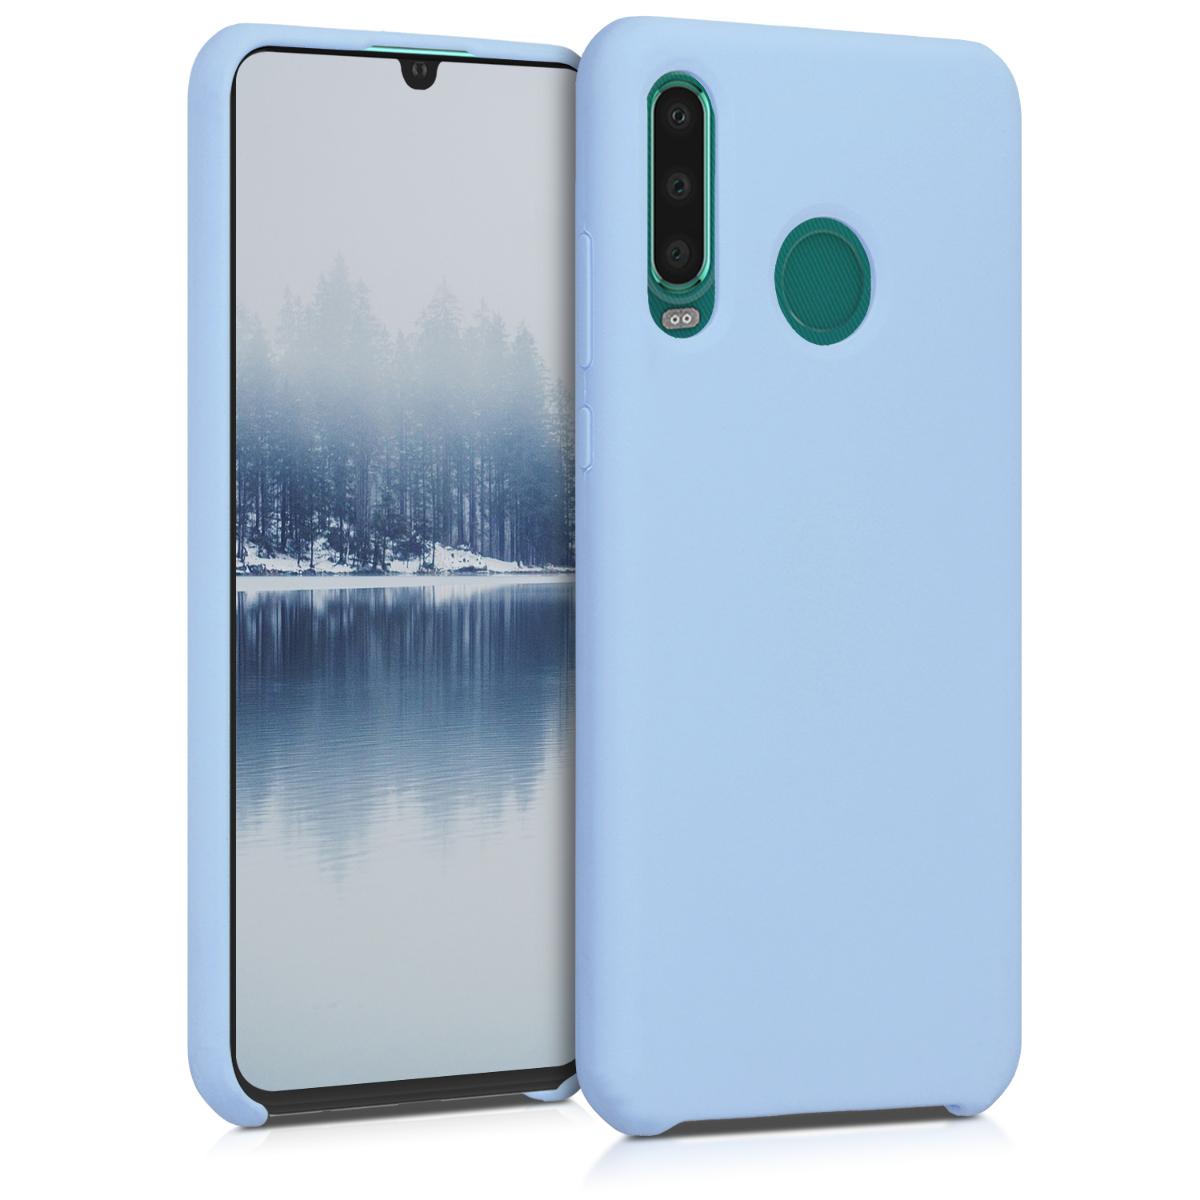 KW TPU Θήκη Σιλικόνης - Huawei P30 Lite - Light Blue Matte (47510.58)